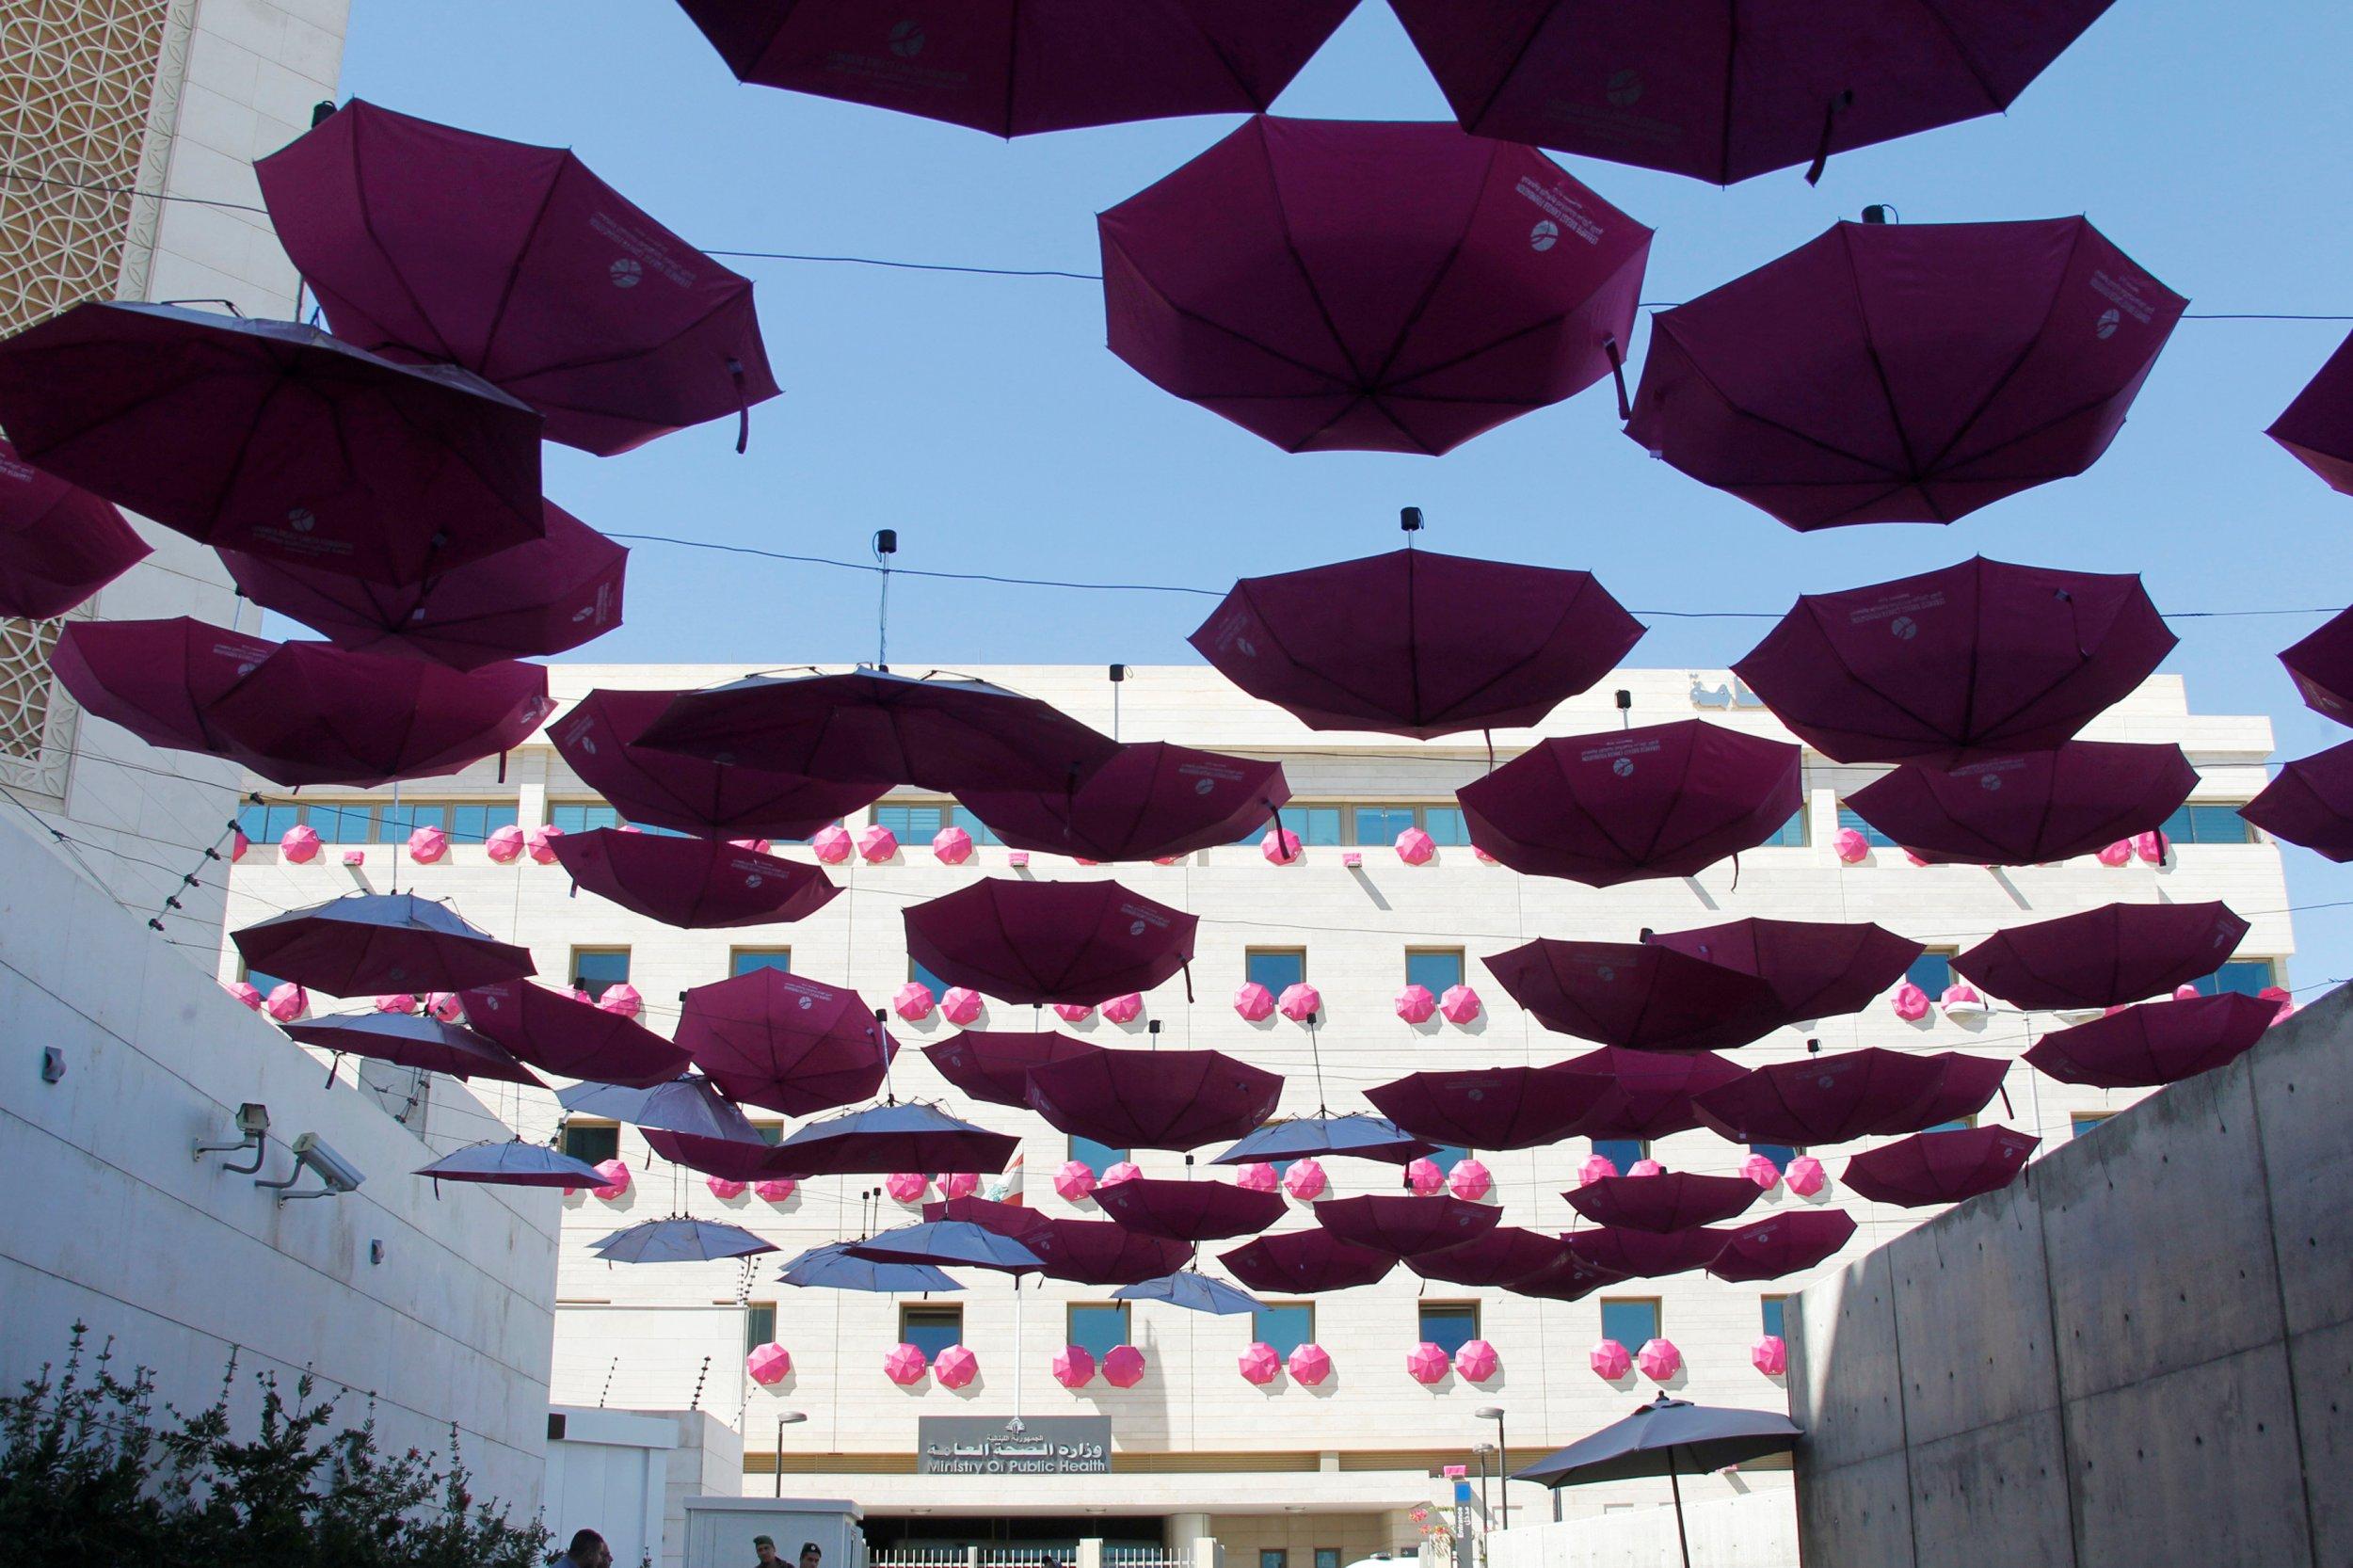 breast cancer awareness umbrellas